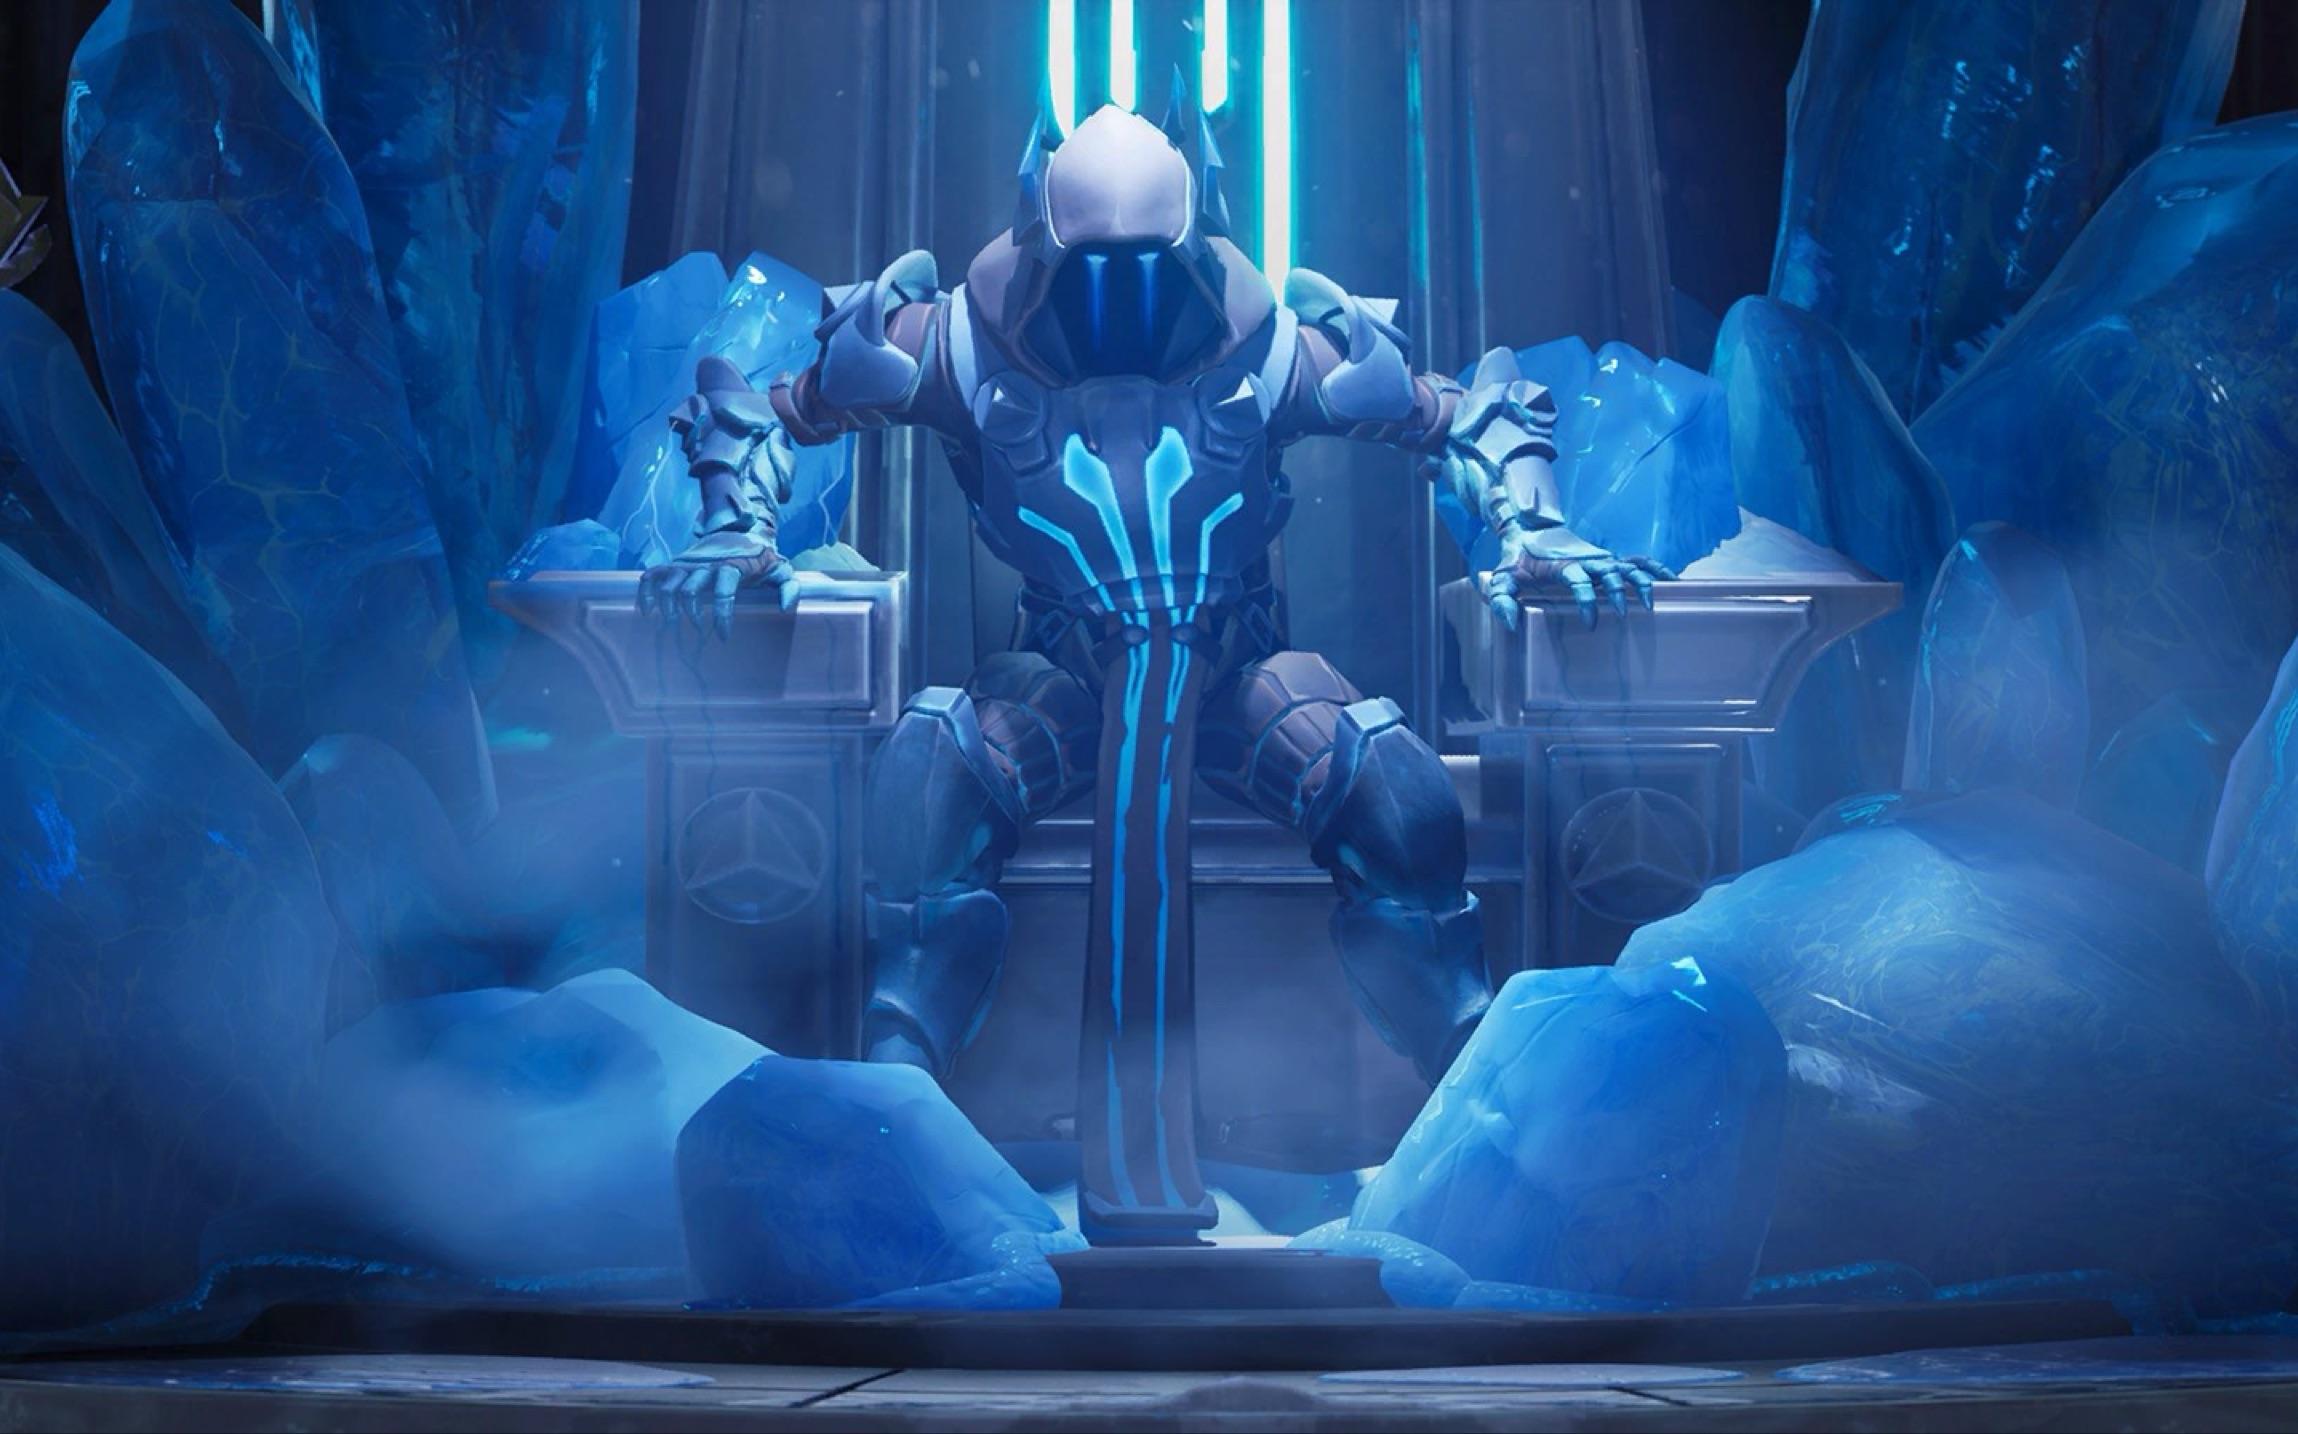 Cool Ice King Hd Background Fortnite Season 7 4505 Fortnite Wallpaper Ice King 2956337 Hd Wallpaper Backgrounds Download